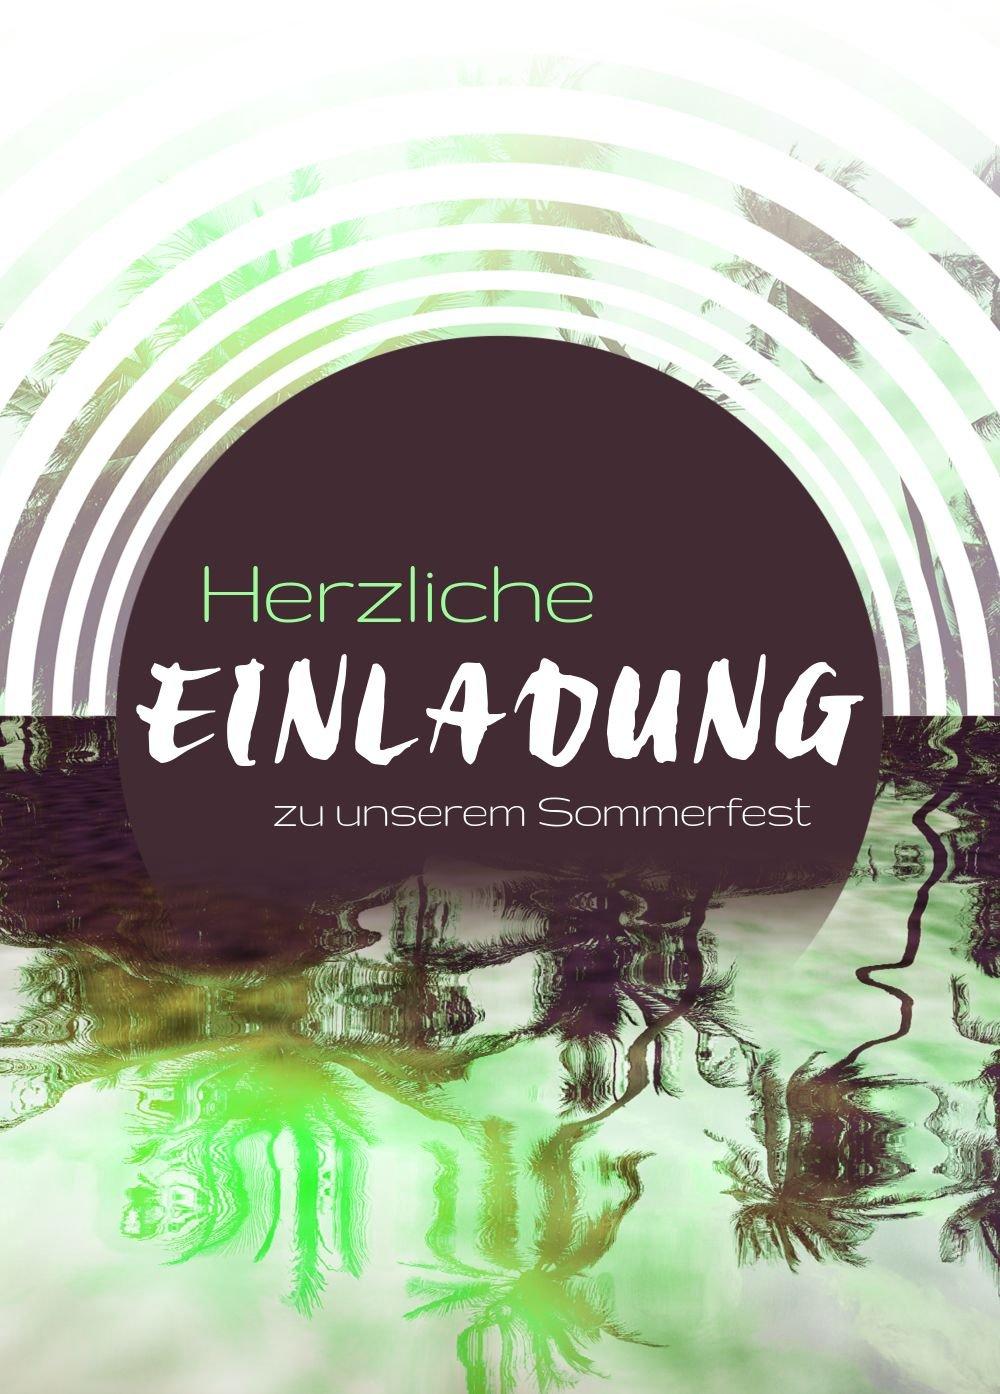 Einladung Sommerfest Sonnenaufgang, 60 Karten, HellgrauLila B0744CZW9S B0744CZW9S B0744CZW9S | Verschiedene Waren  | Mangelware  | Zürich Online Shop  90d48e